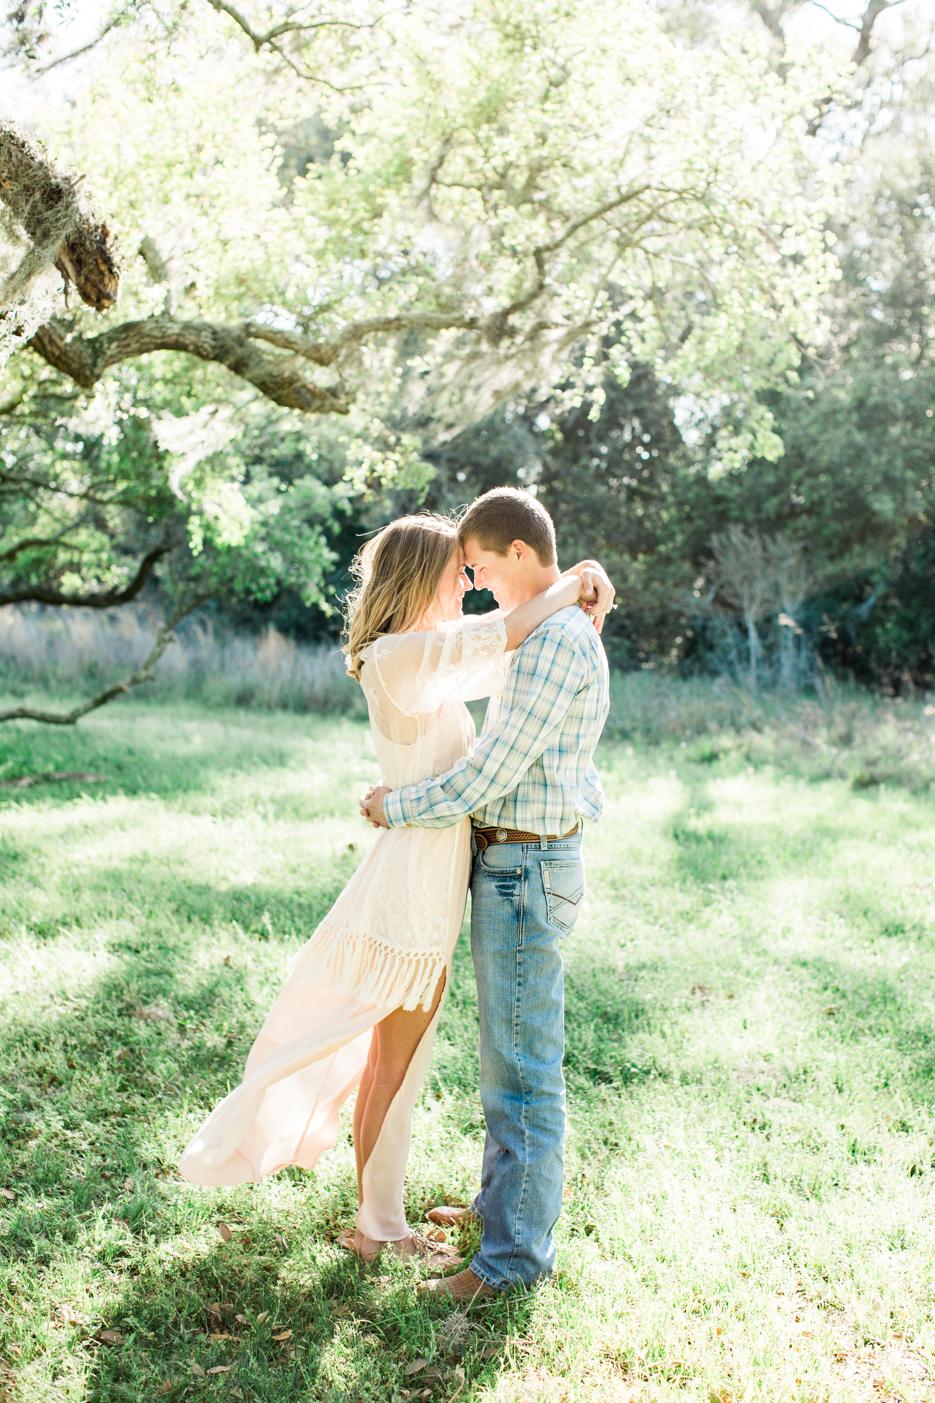 Britt Latz Photography_Joines_Engagement Collection-4.jpg